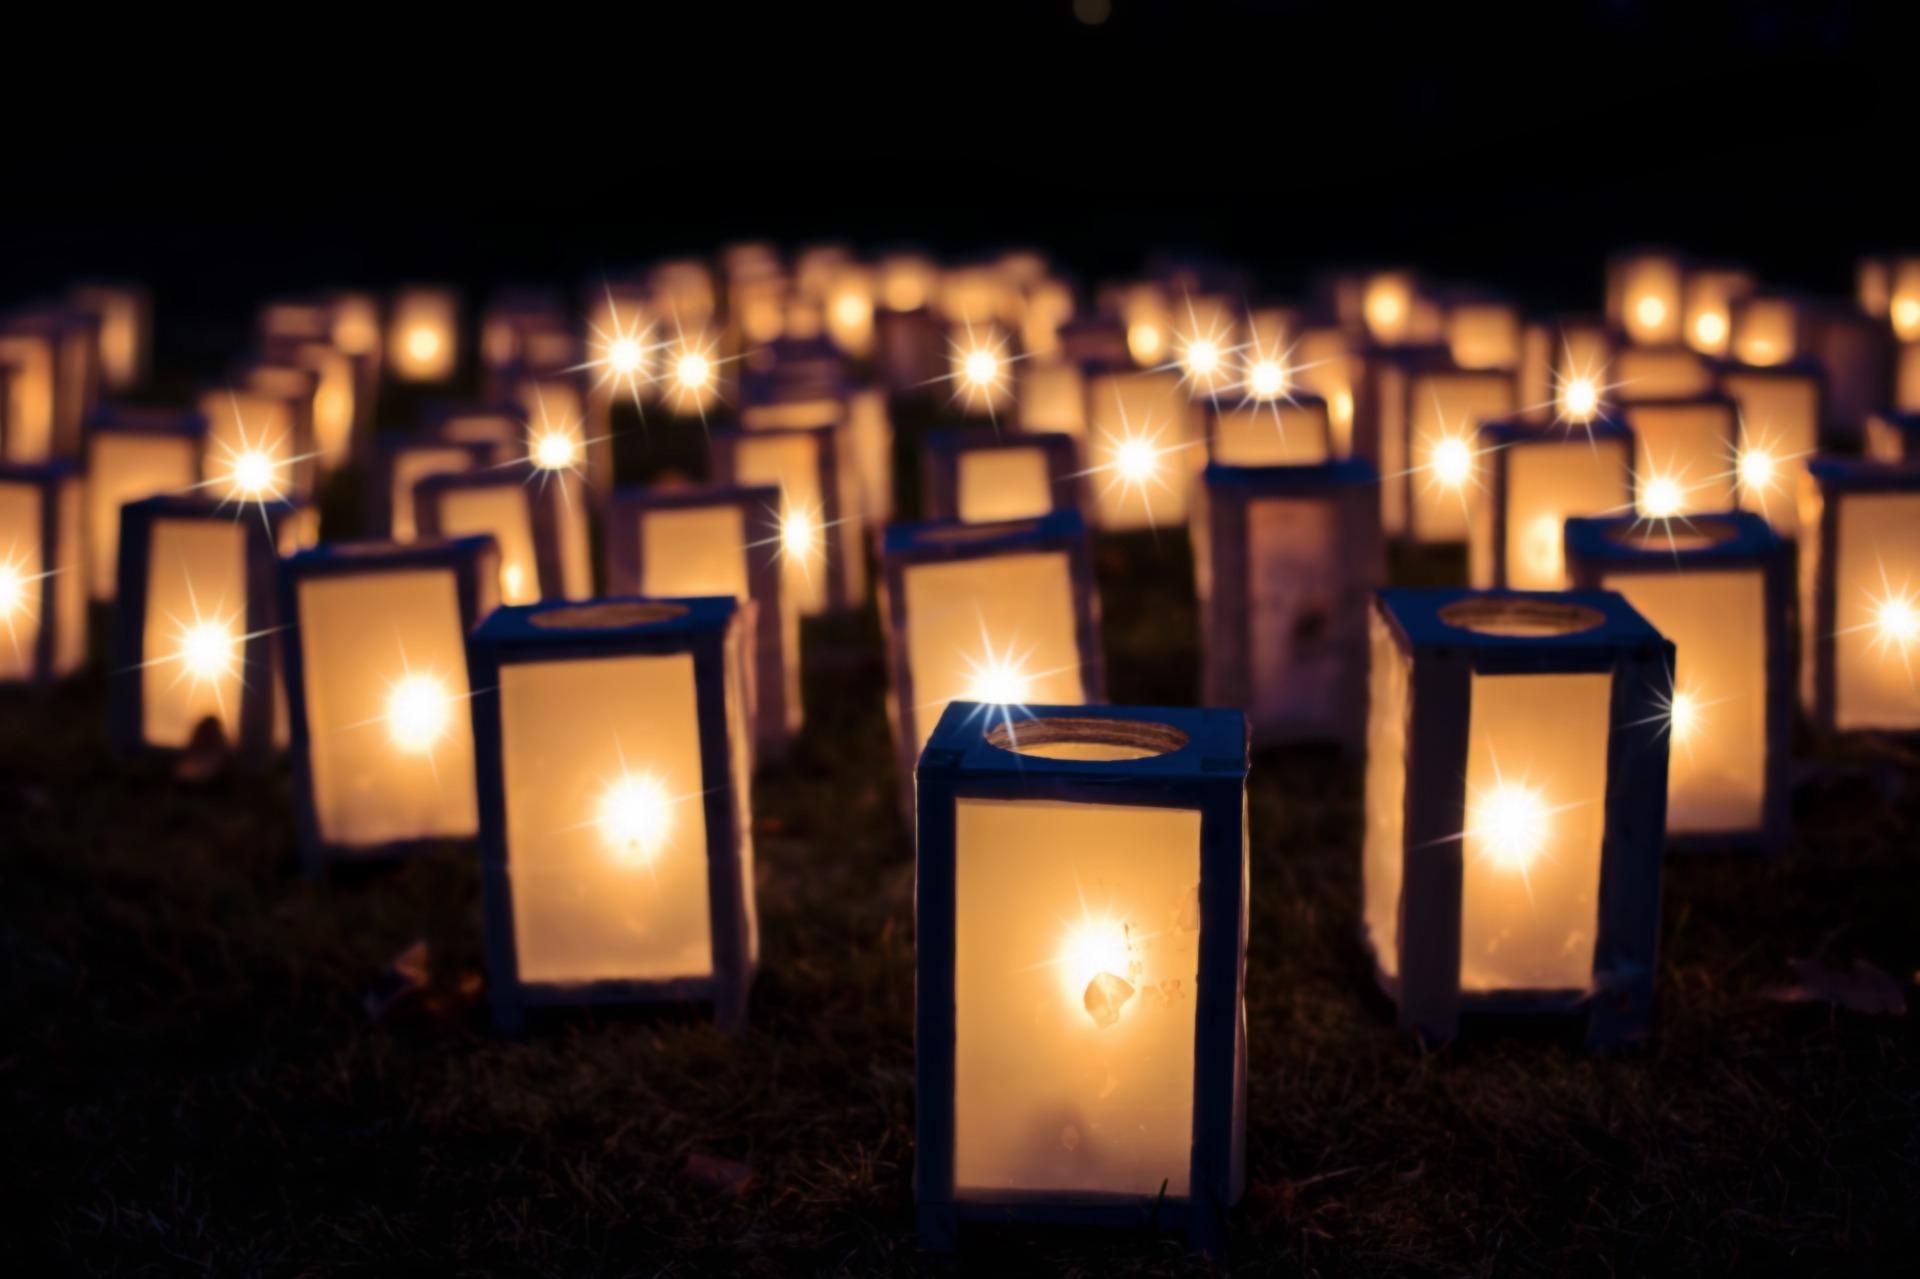 Brookgreen Gardens Night of 1000 Candles display